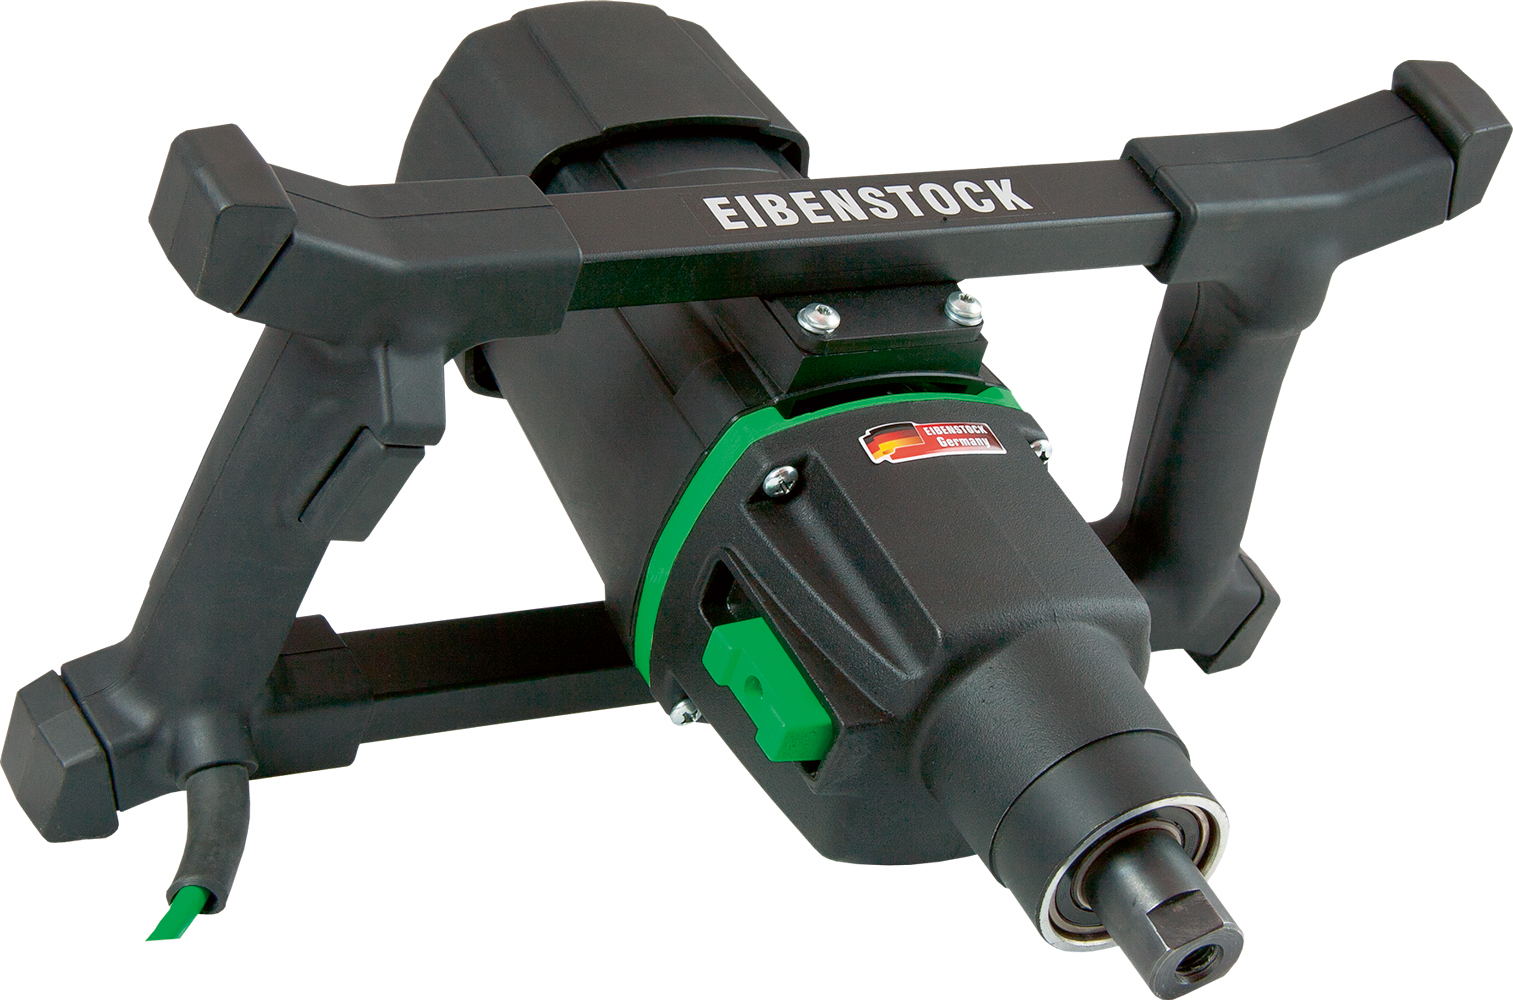 Eibenstock Handrührgerät EHR 23/2.5 Set